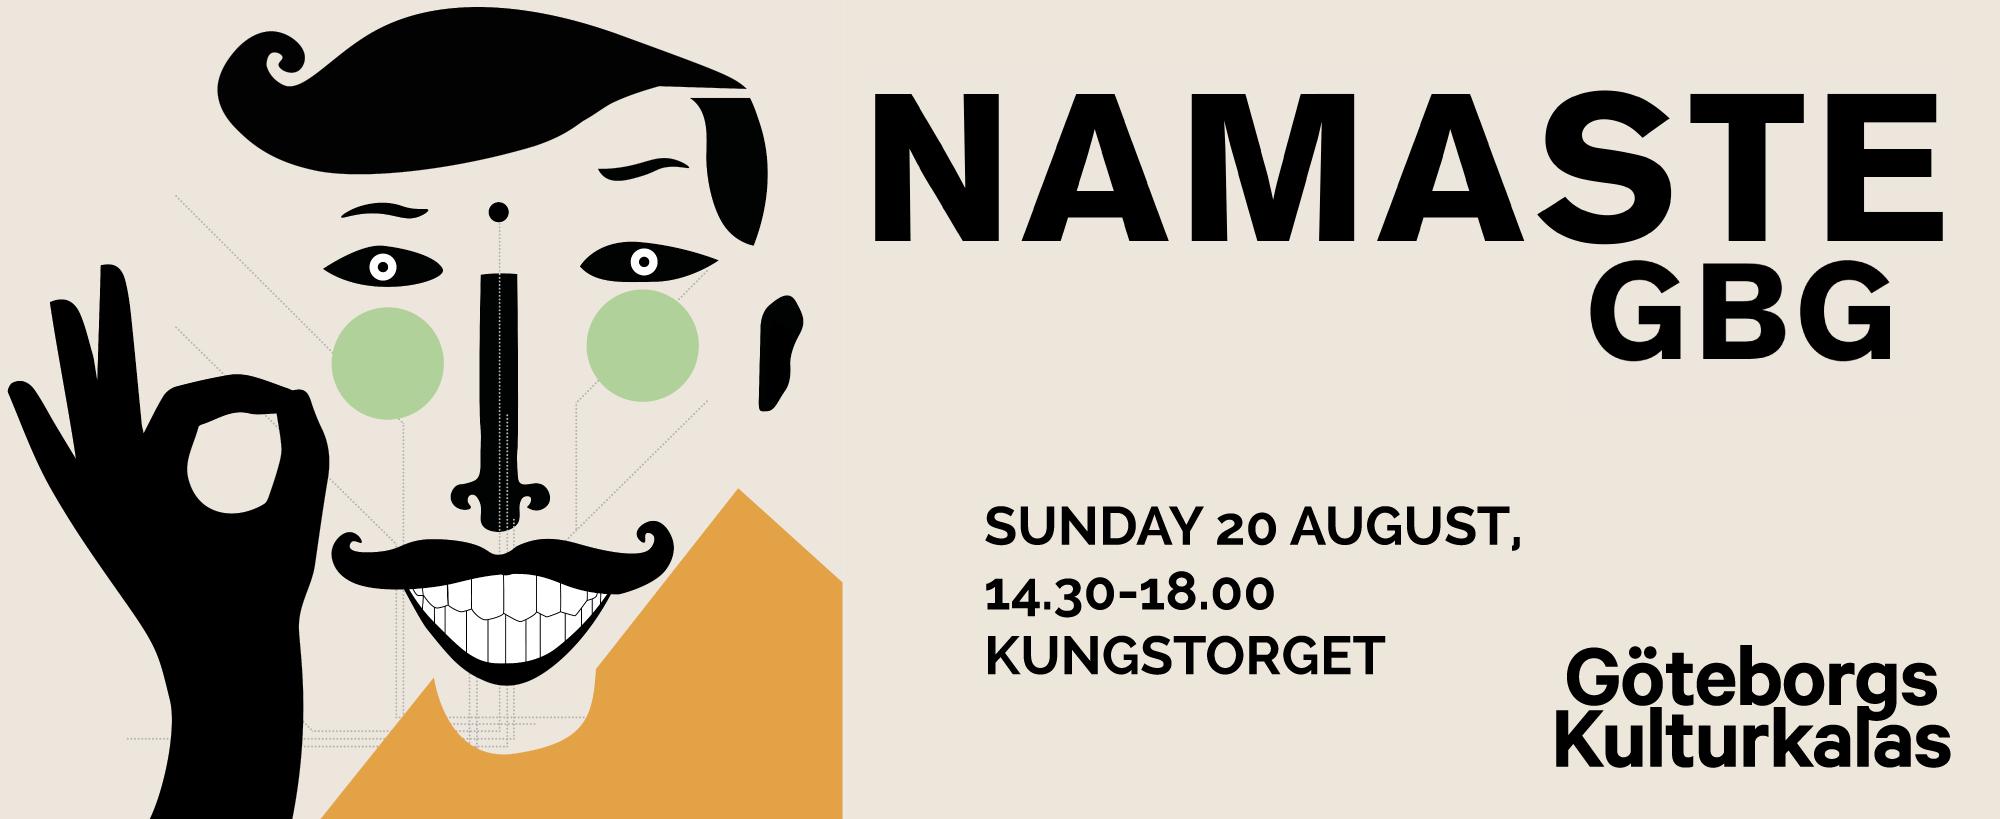 Namaste Gbg 2017